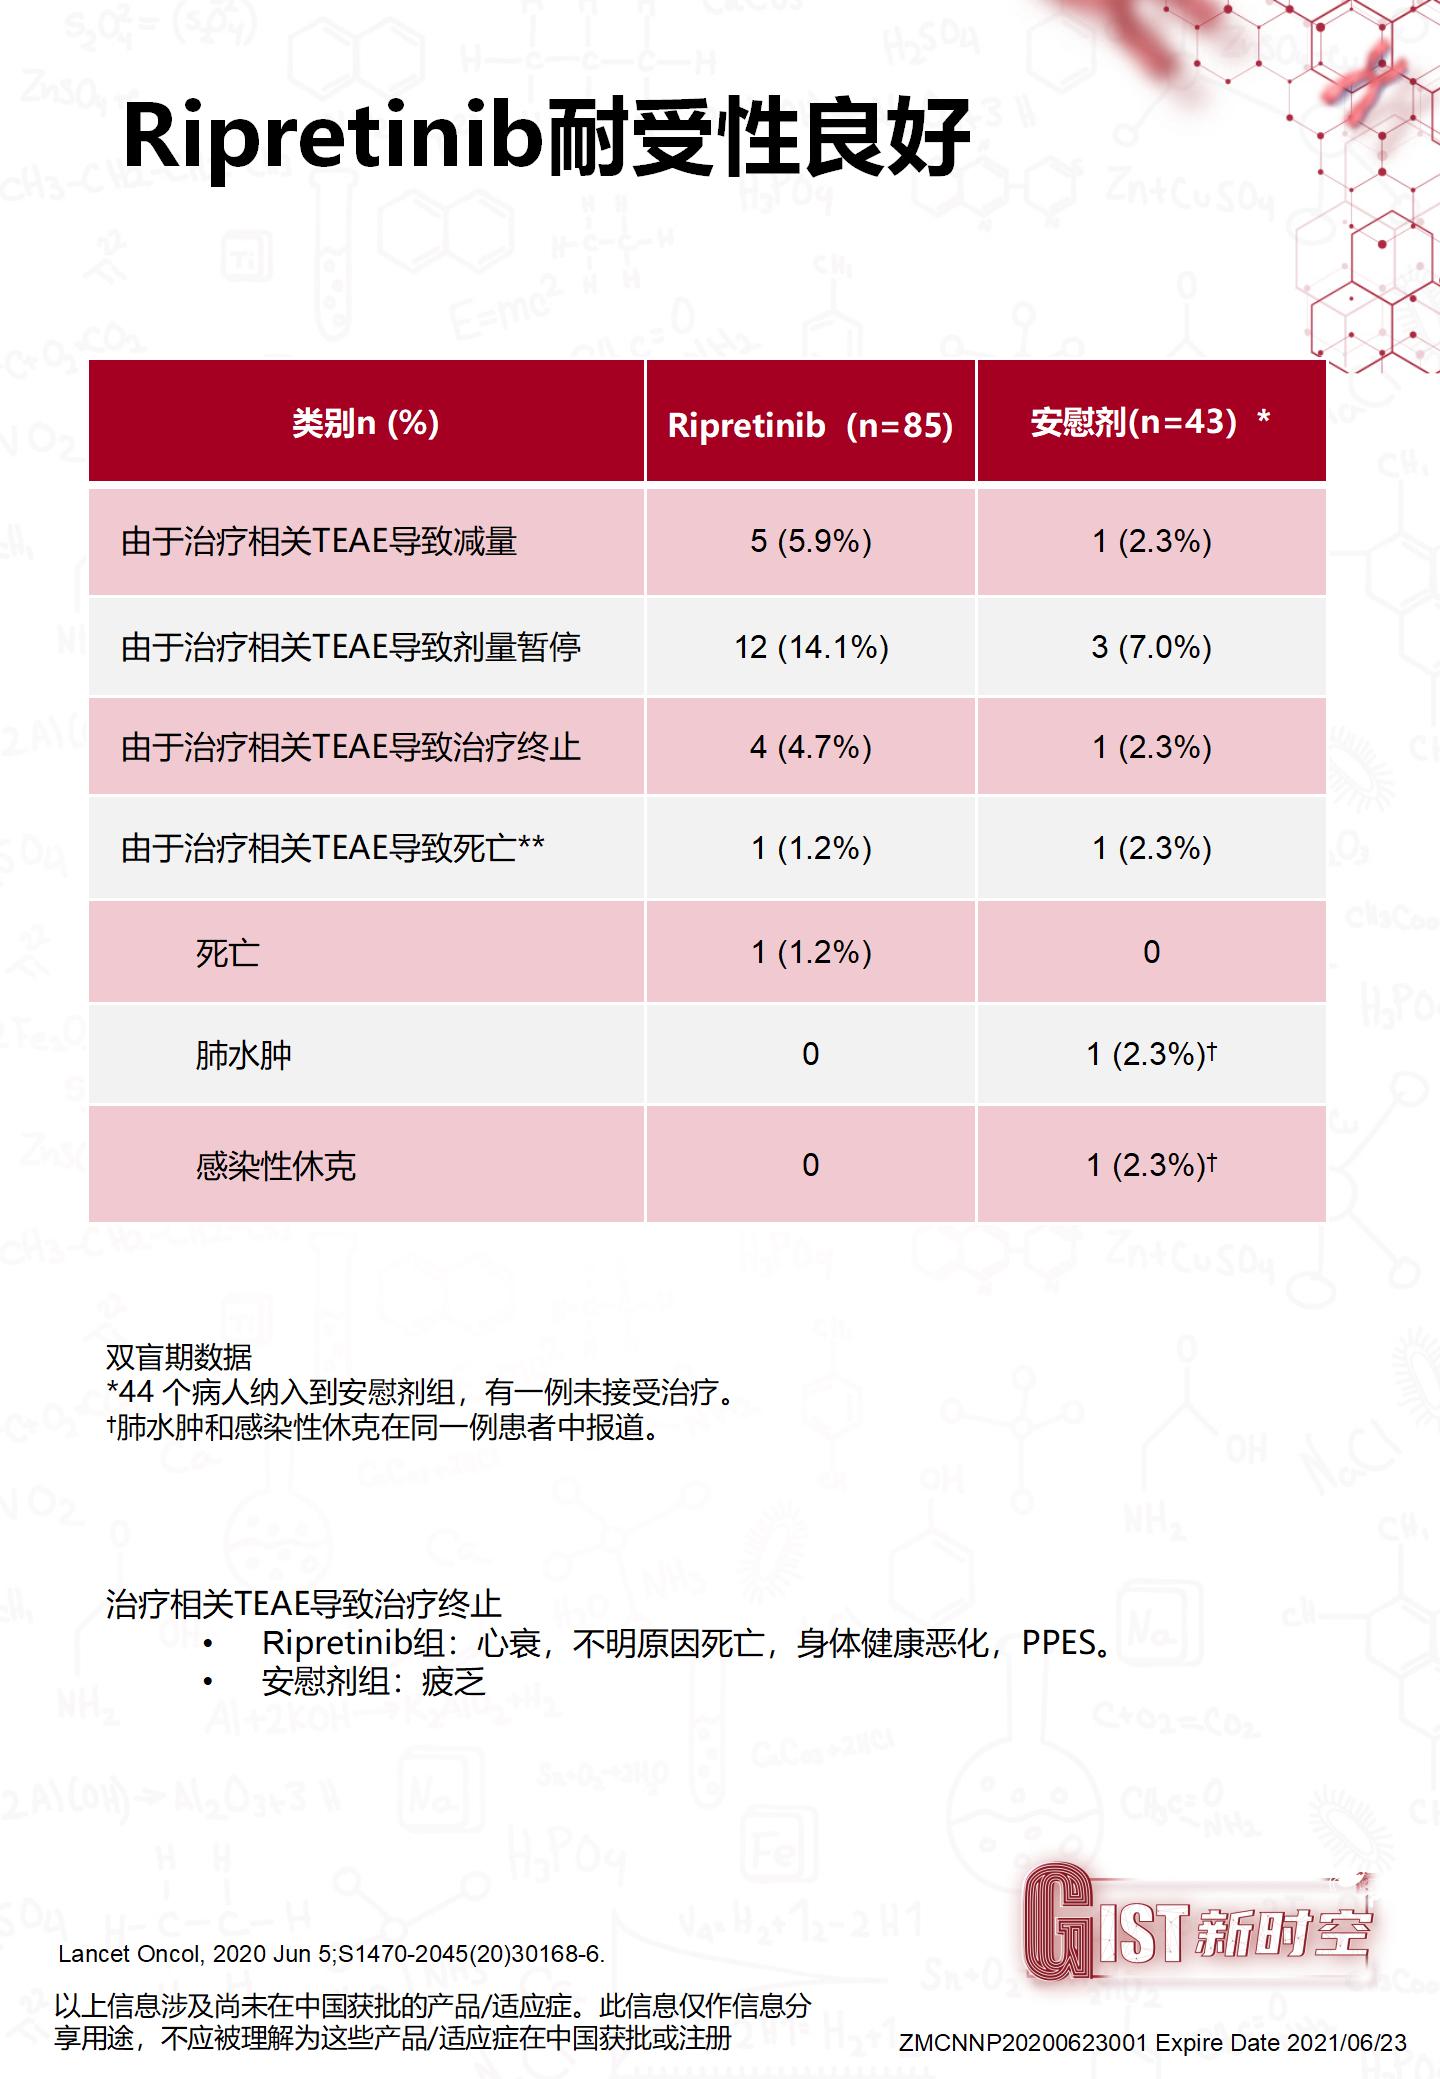 ※20200626_INVICTUS_吴欣_final_替换模板后(1)_11.png